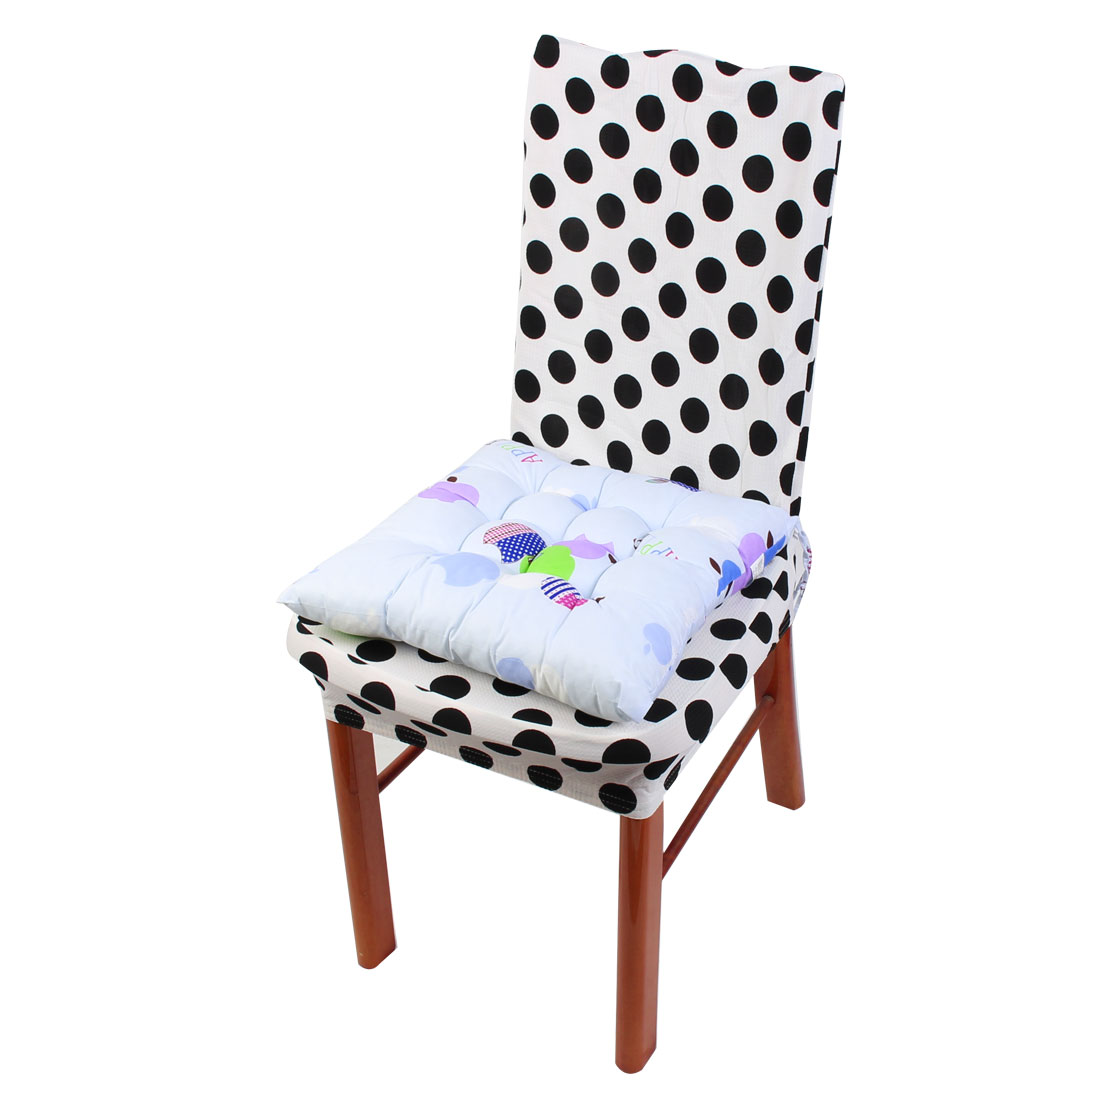 Household Office Polyester Apple Print Keeping Warm Chair Cushion Pad Light Blue 40 x 40cm